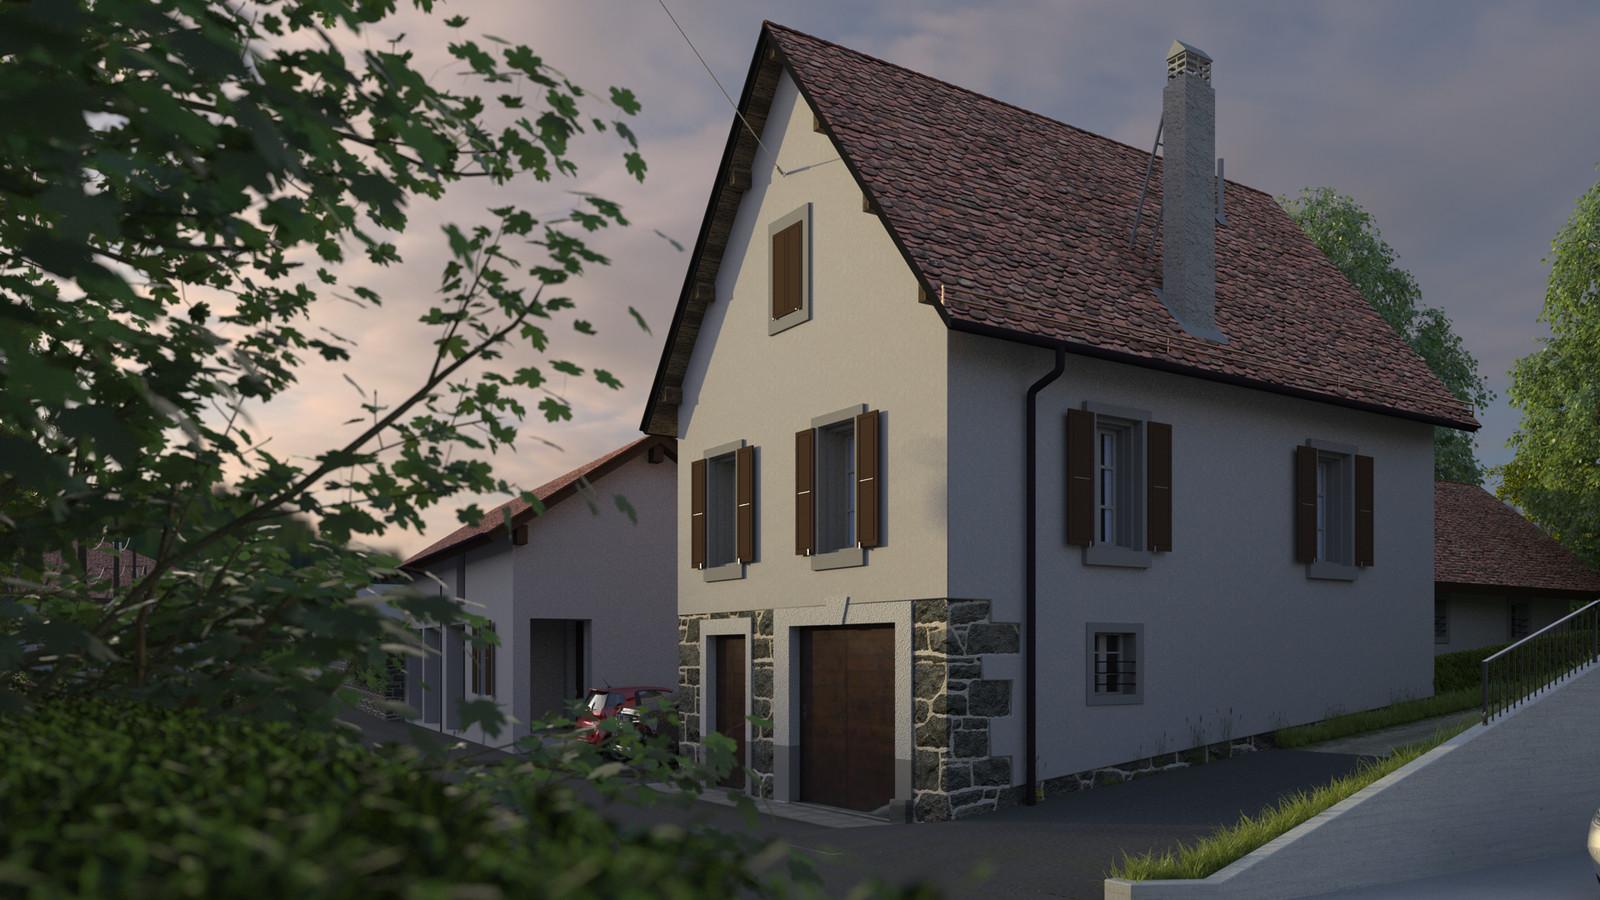 SketchUp + Thea Render  Little Swiss House Scene 28 0917 Dawn 02 HD 1920 x 1080 Presto MC